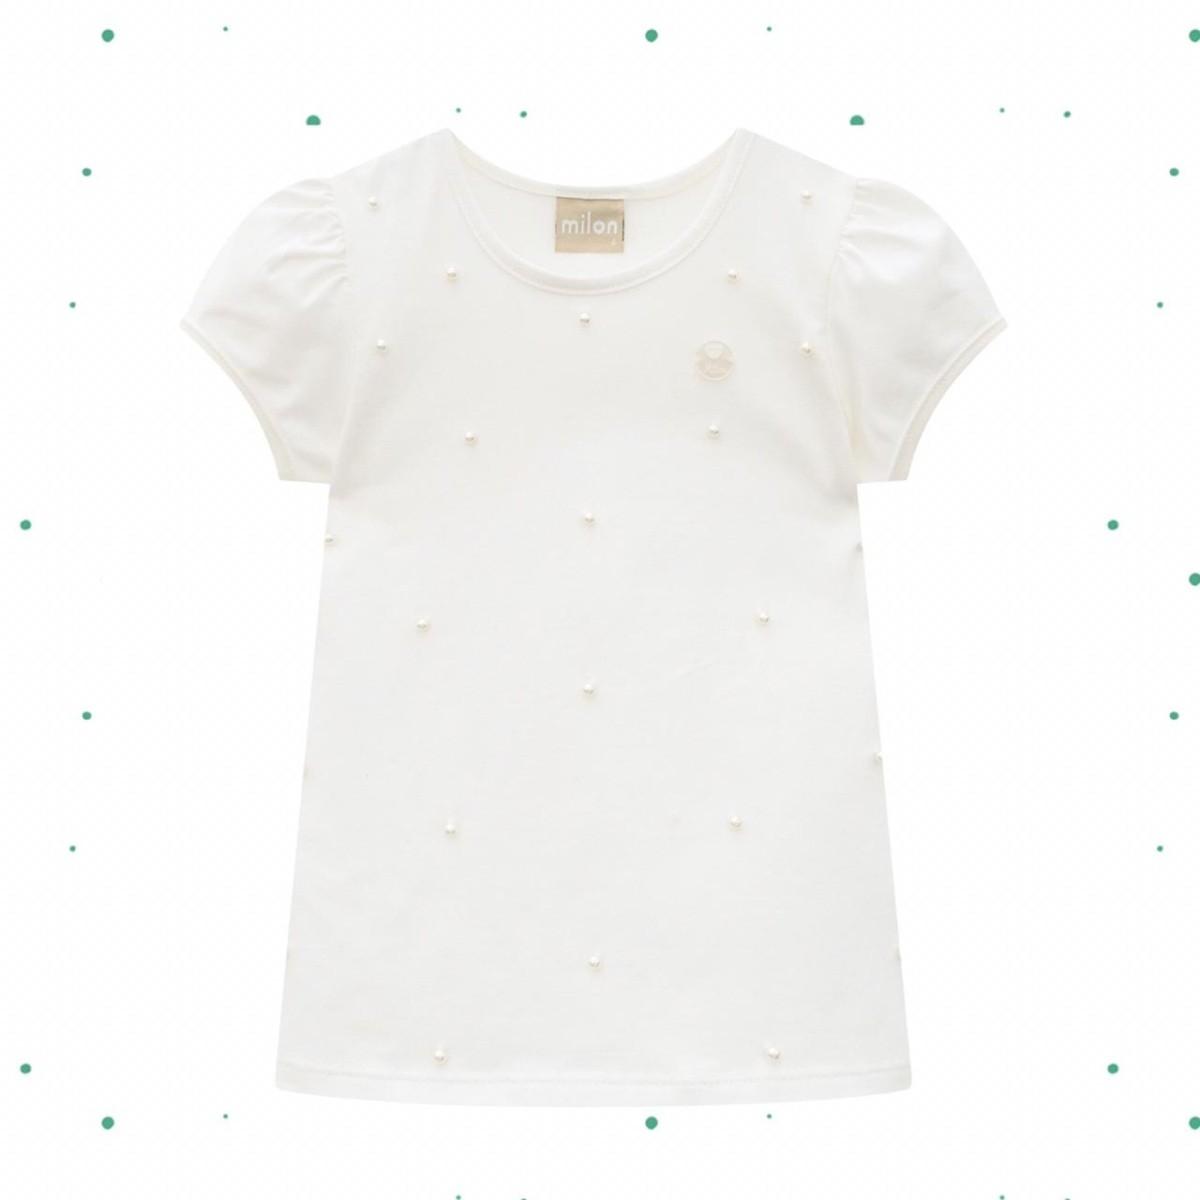 Blusa Menina Milon em Cotton Off White